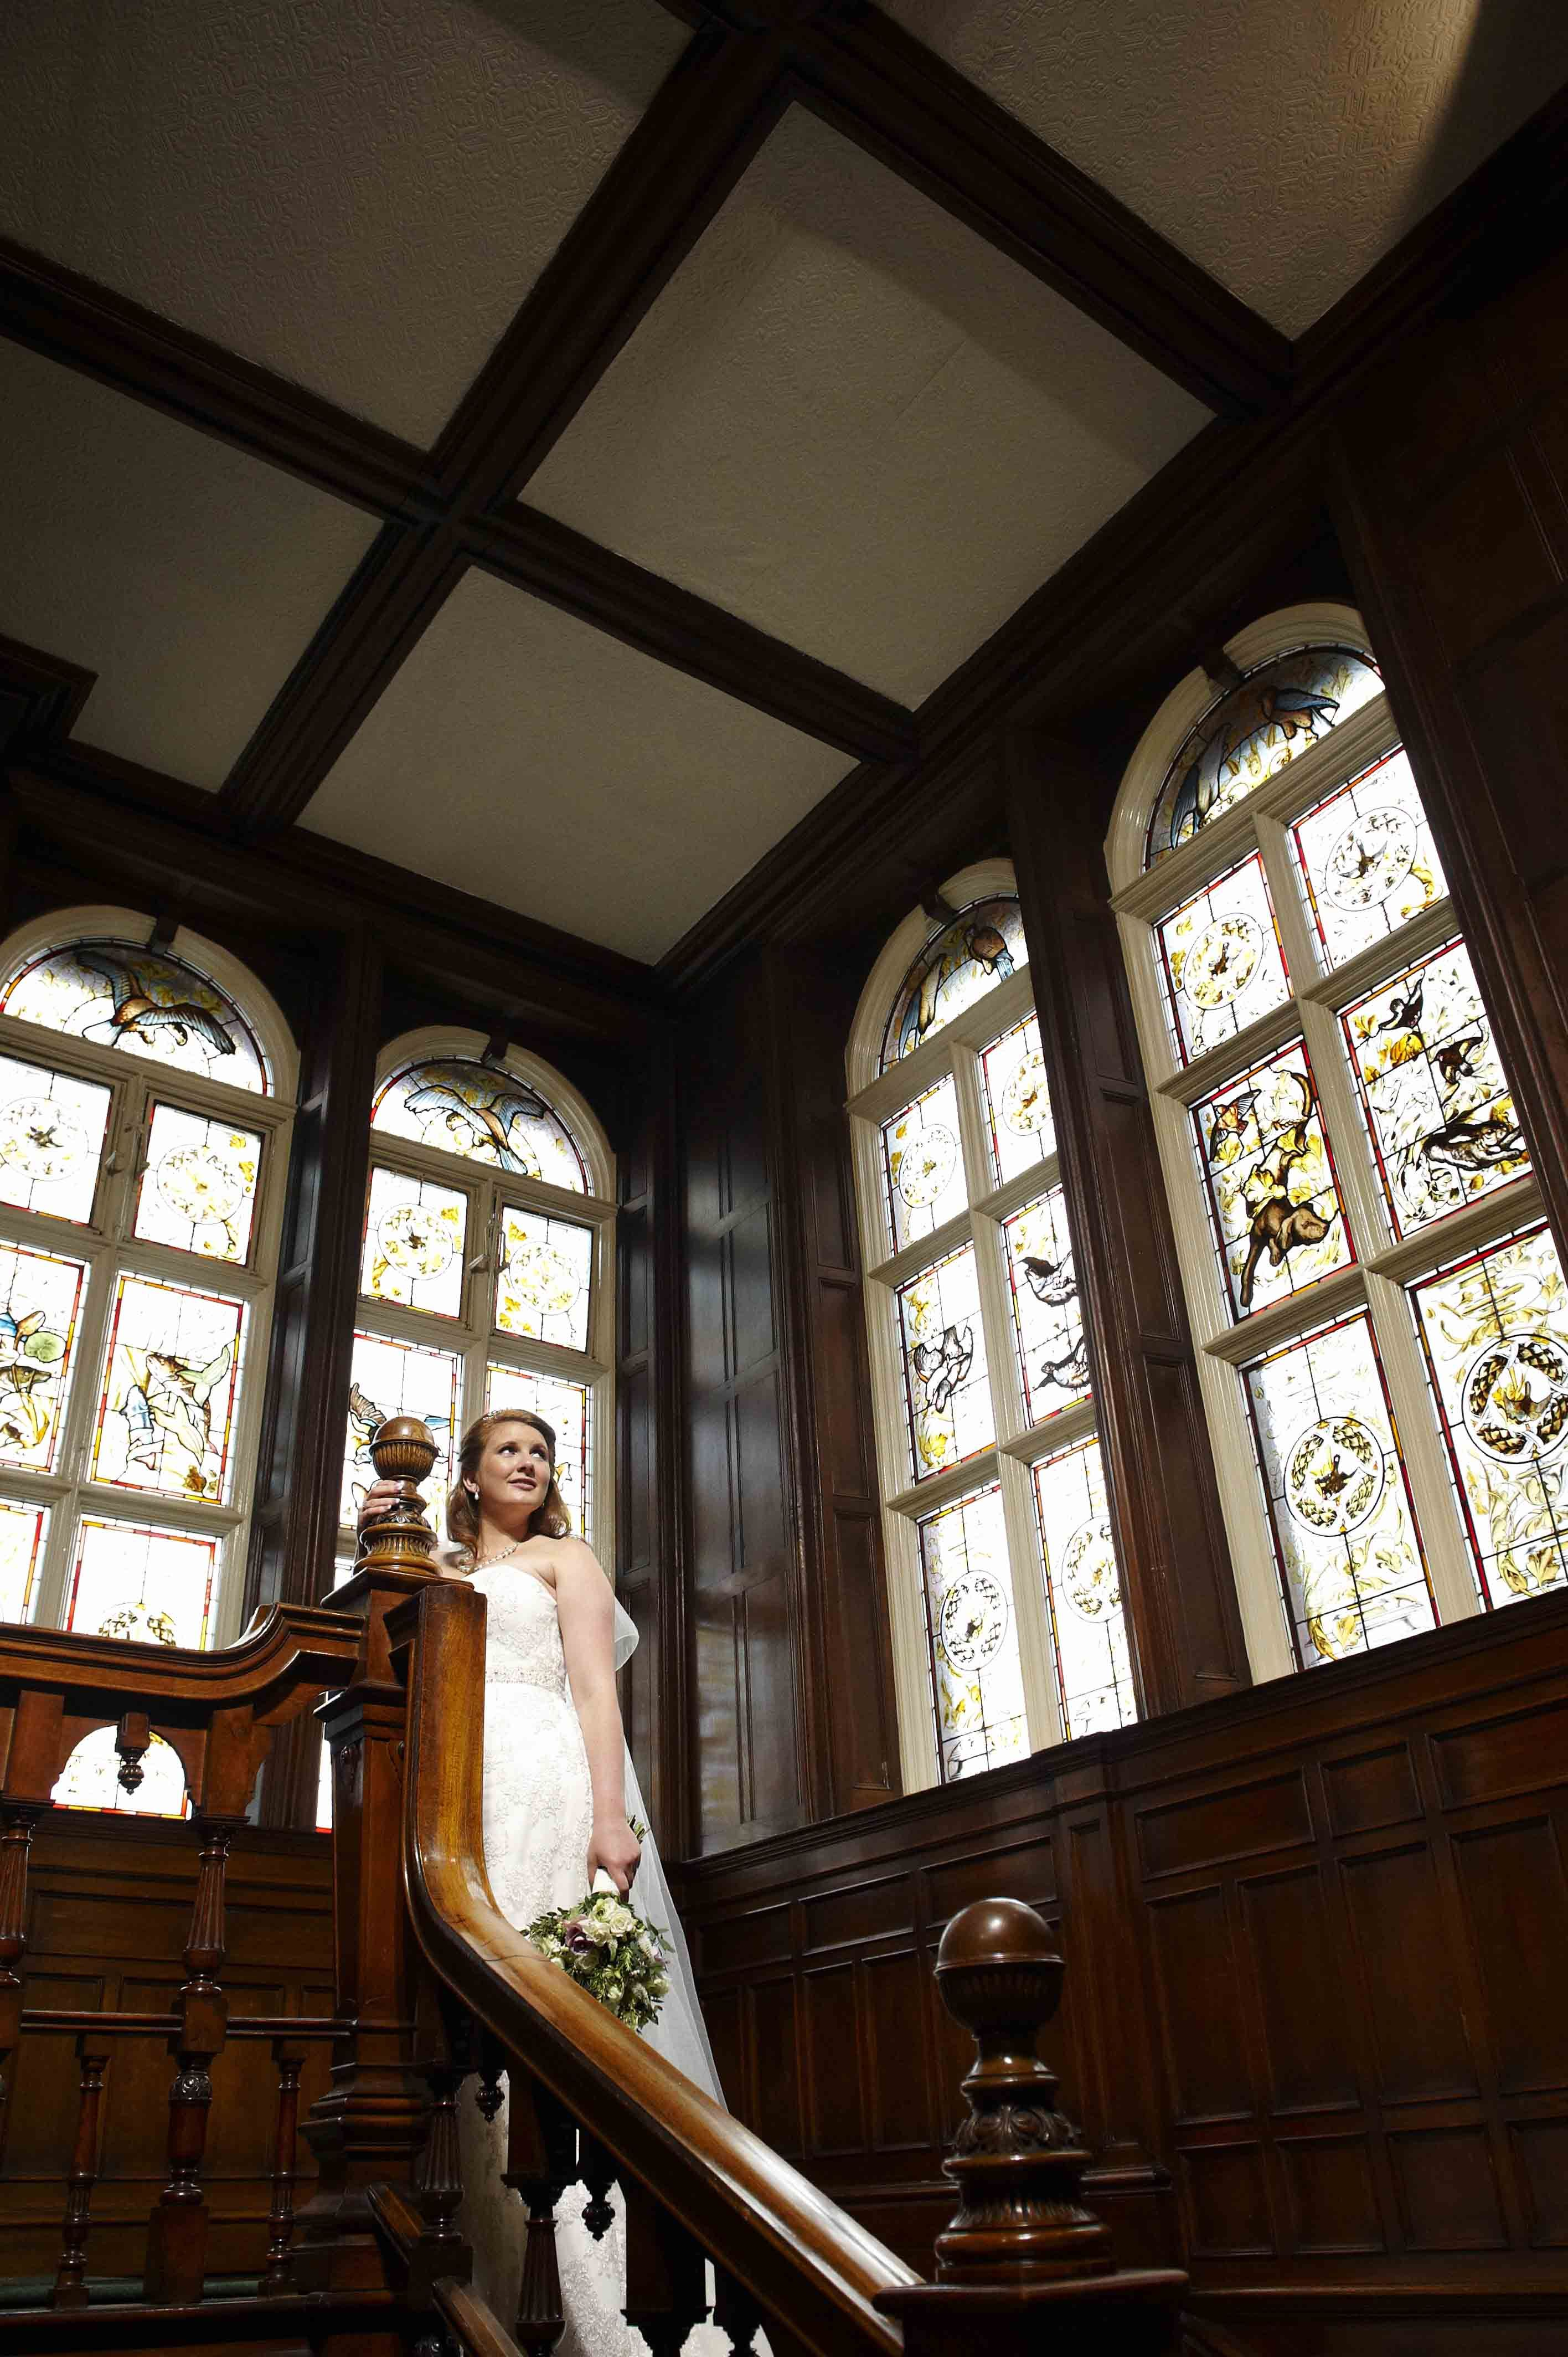 north yorkshire wedding photography; wedding photography